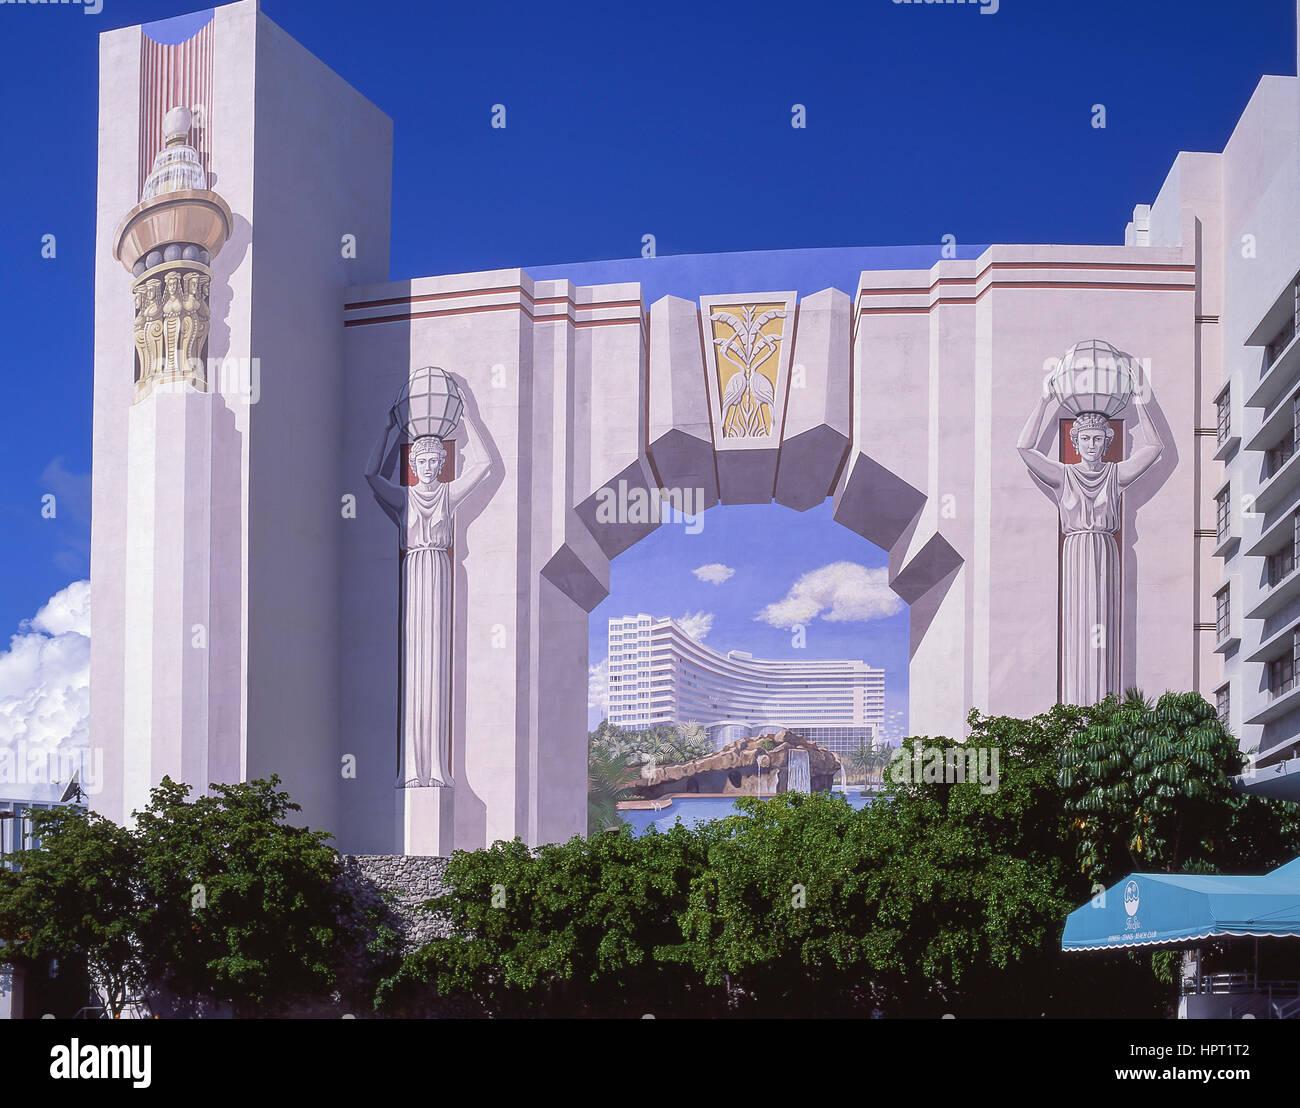 art deco trompe lil mural fontainebleau hotel collins avenue south